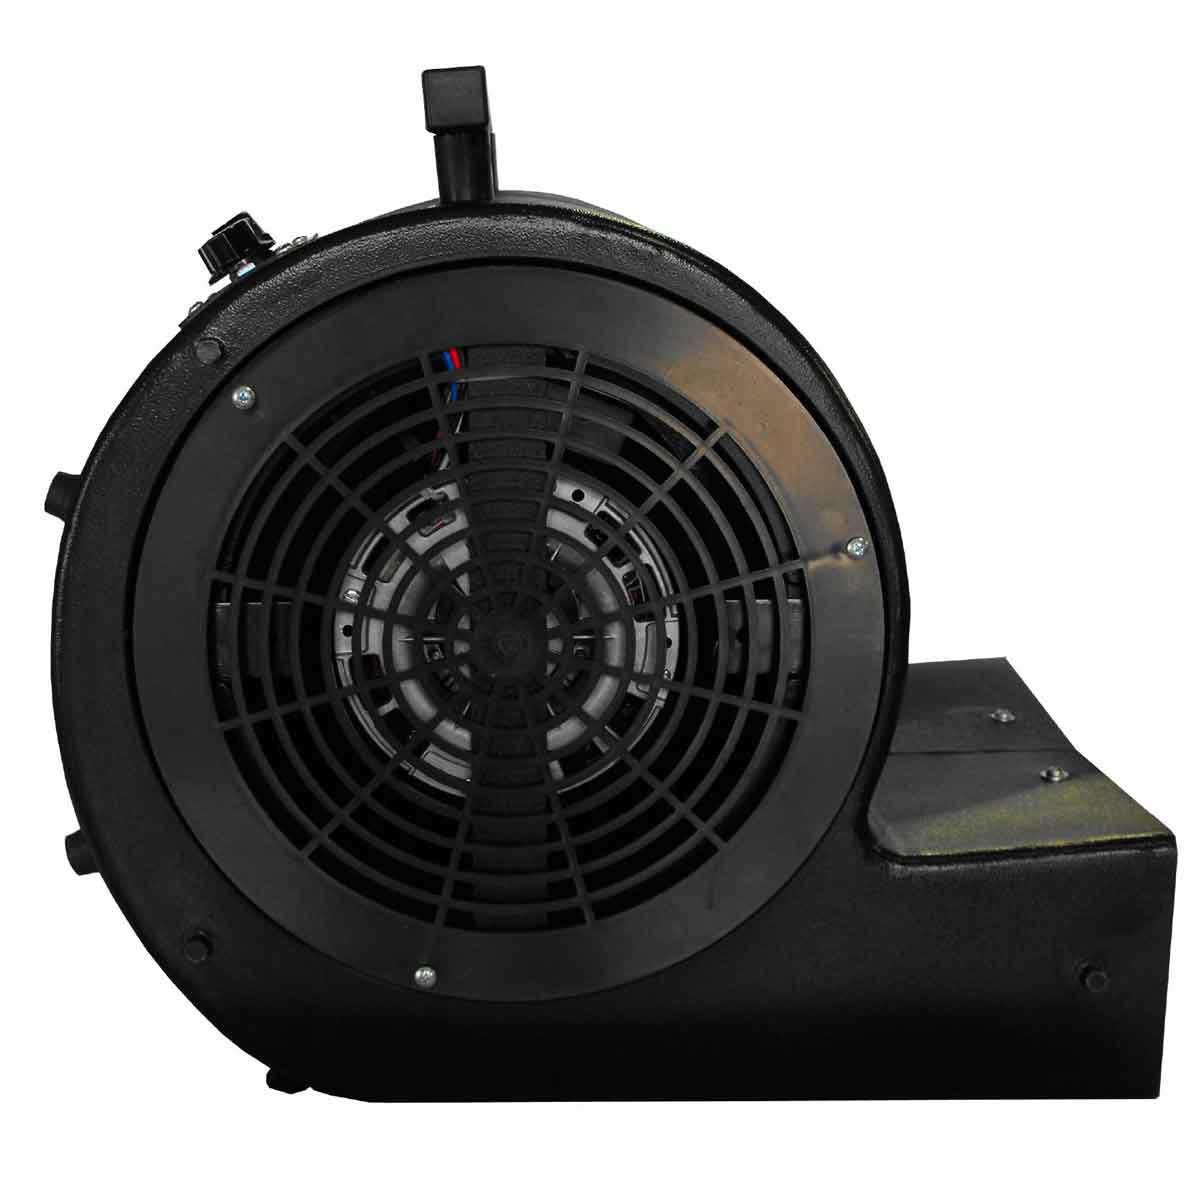 Hawk Black 1/2 hp Industrial Blower